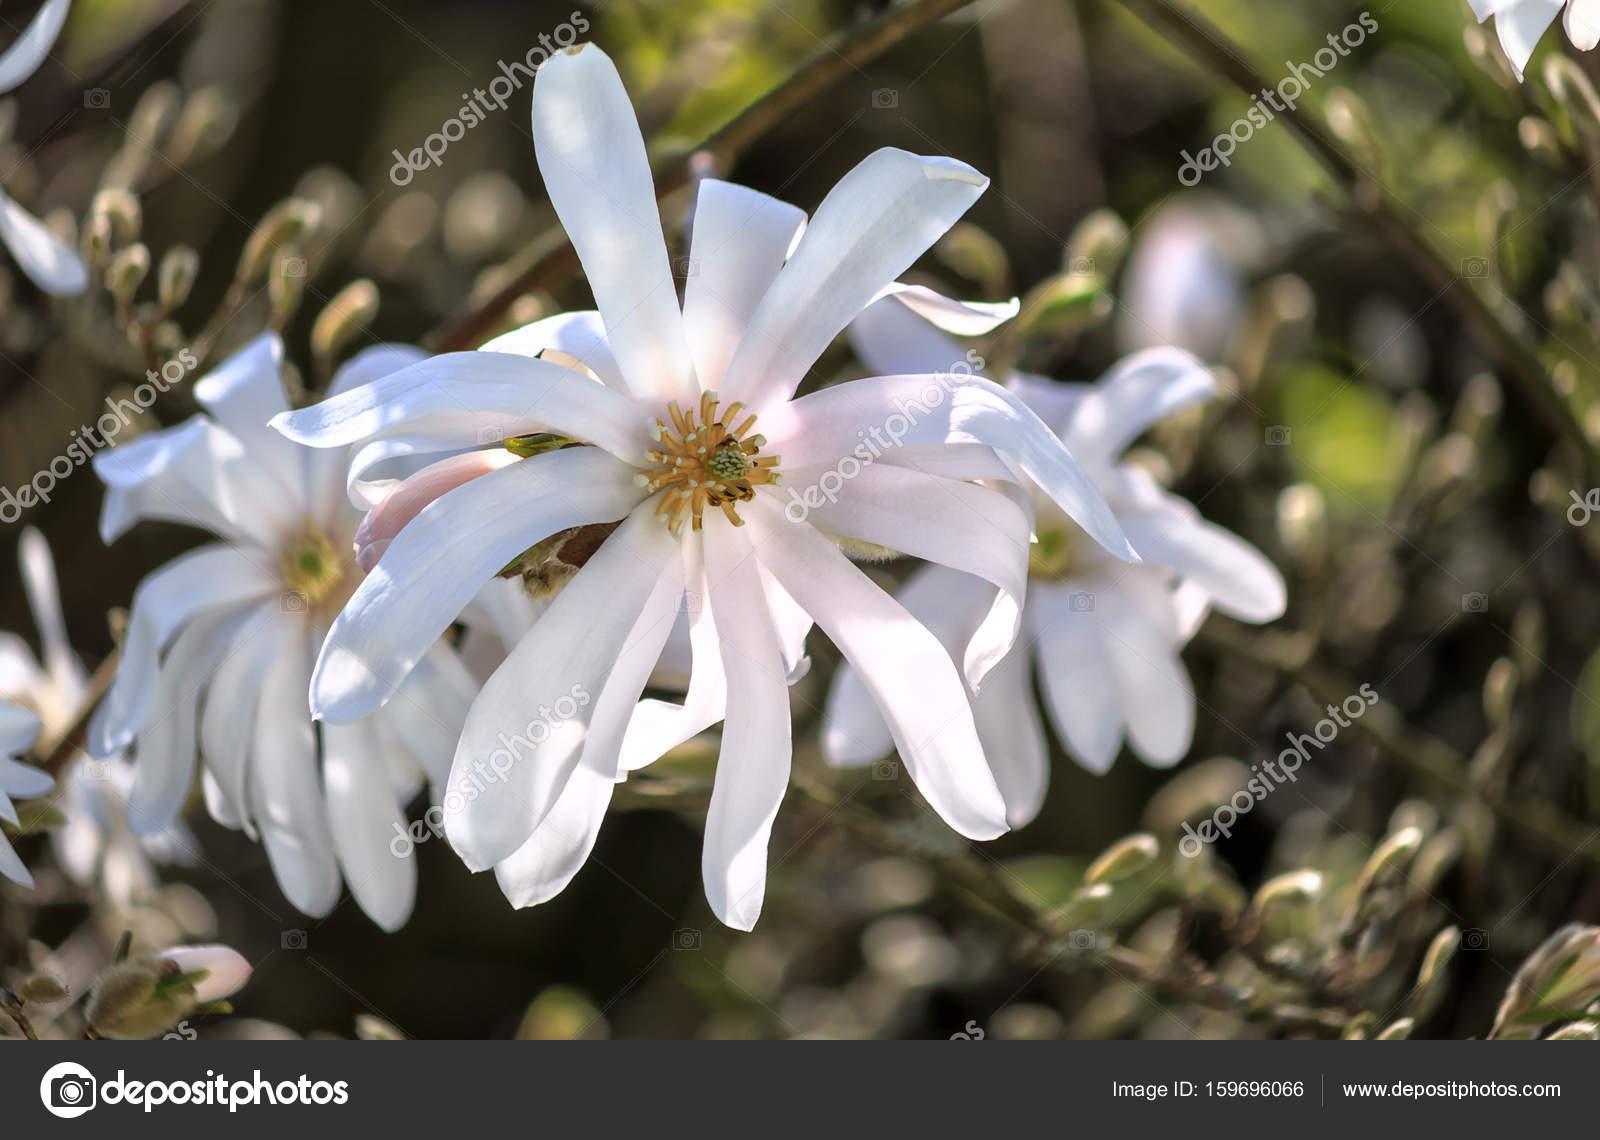 Star magnolia white flowers stock photo moskwa 159696066 star magnolia white flowers stock photo mightylinksfo